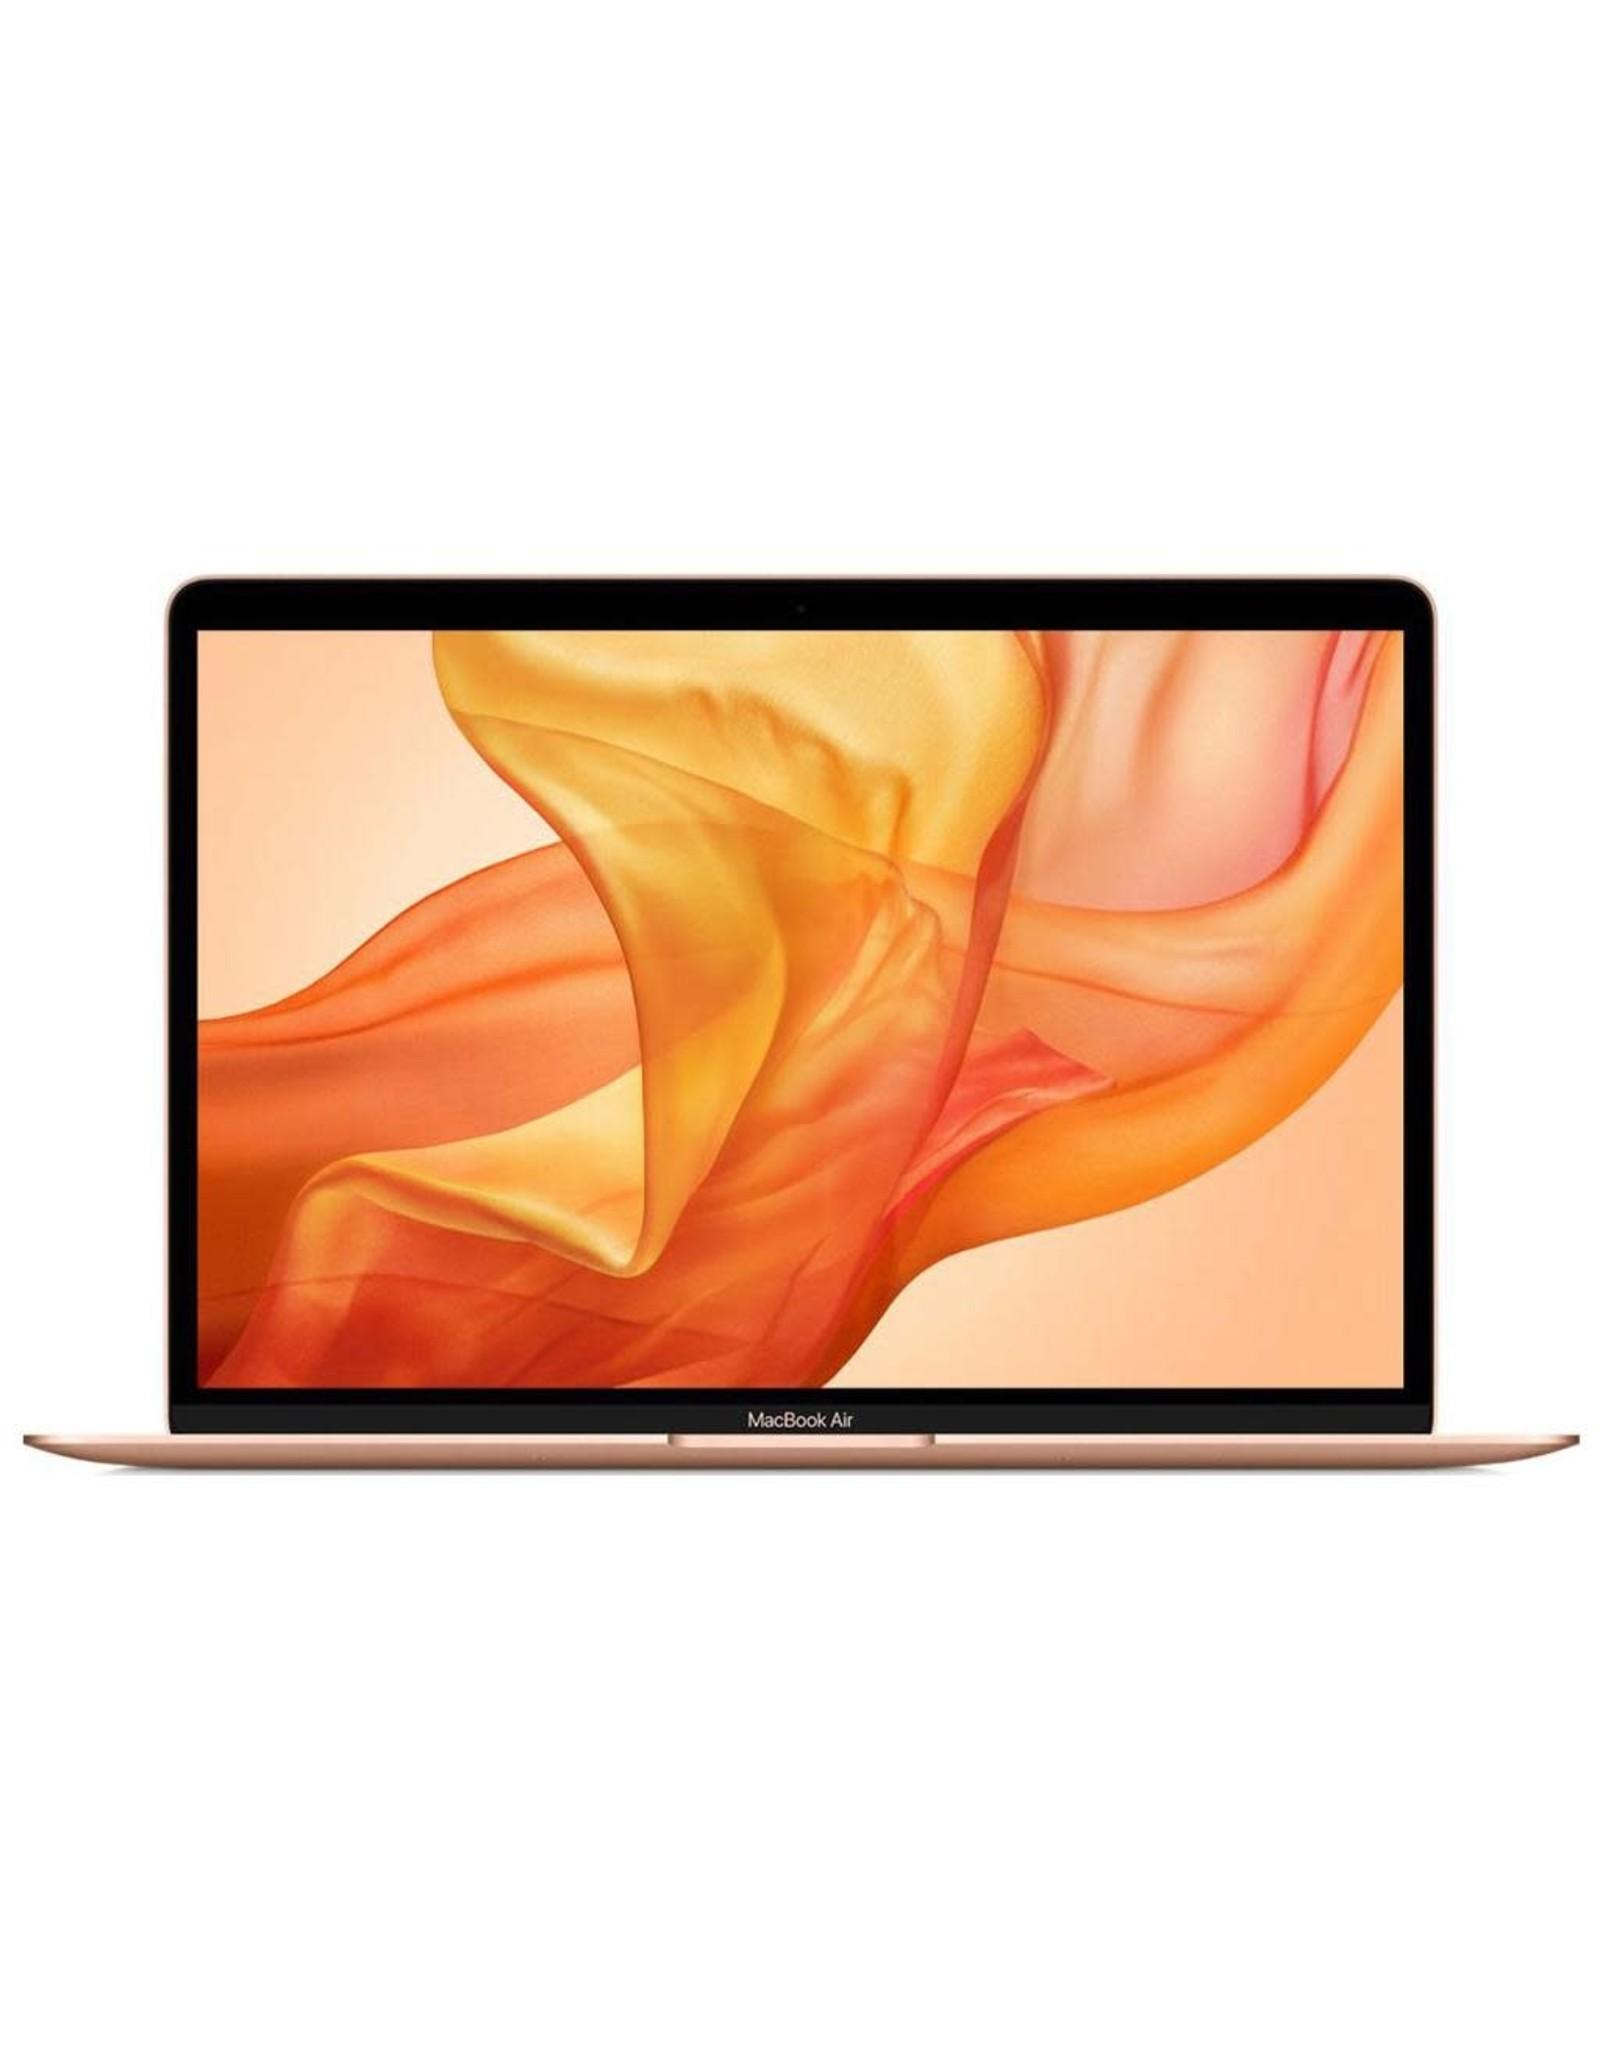 Apple Superseded - Apple 13-inch MacBook Air 256GB 1.1GHz dual-core i3 8GB RAM Intel Iris Plus